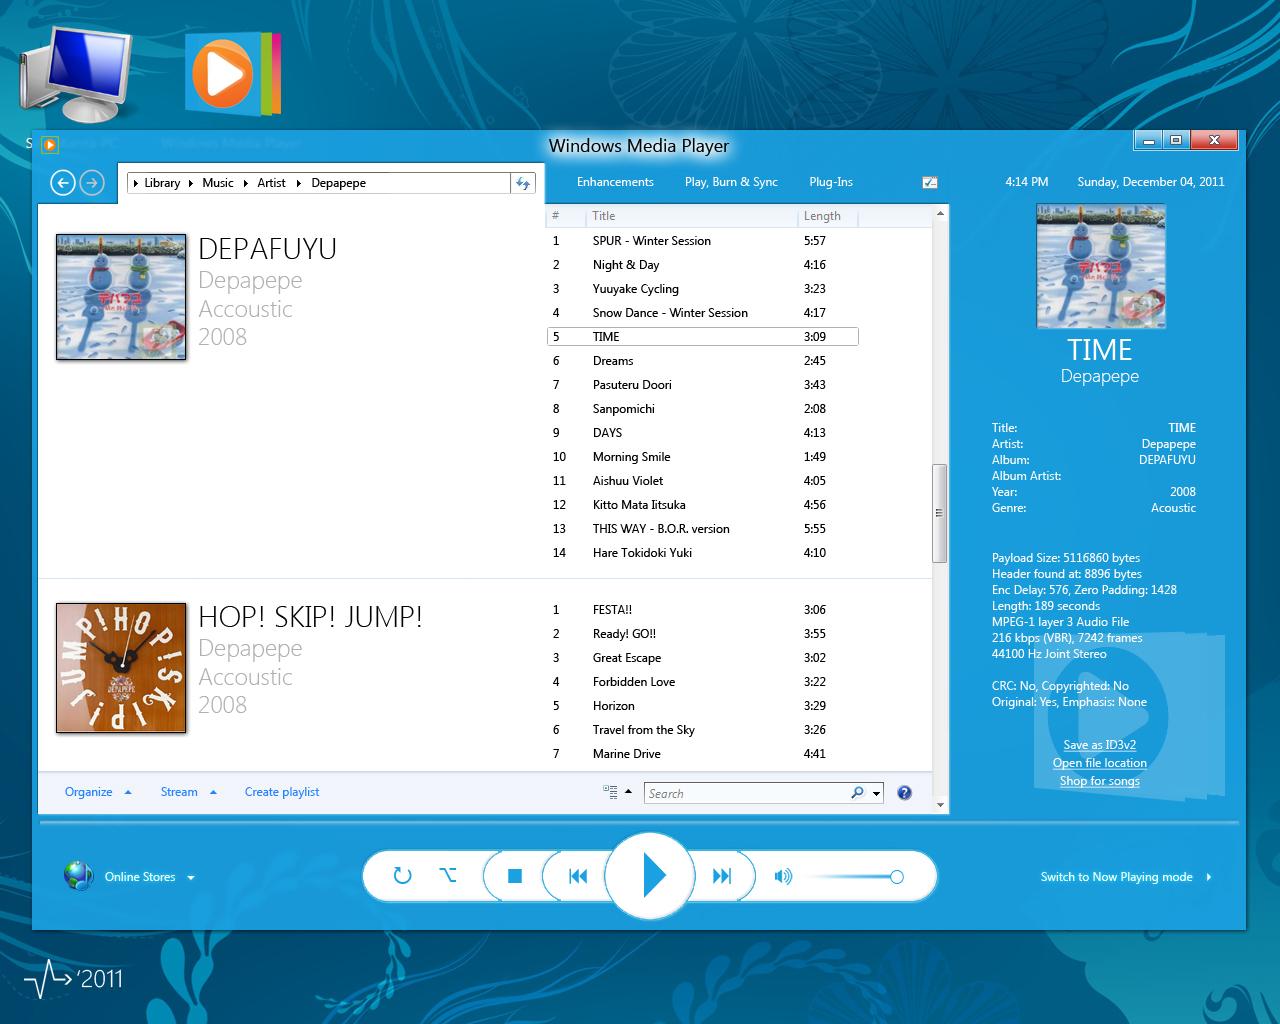 windows media player 10 windows 7 64 bit download